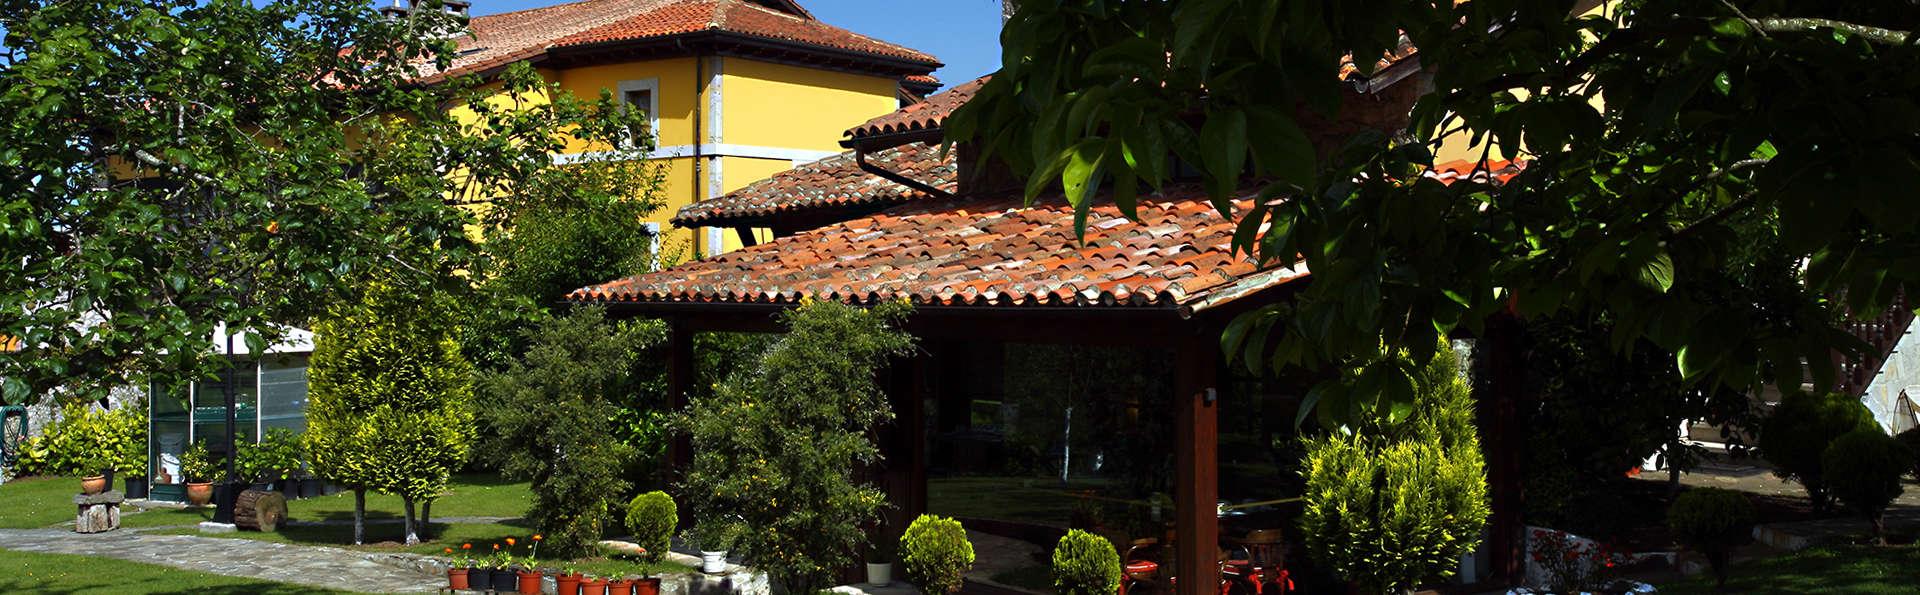 Arcea Hotel Mirador de la Franca - EDIT_Exterior1.jpg